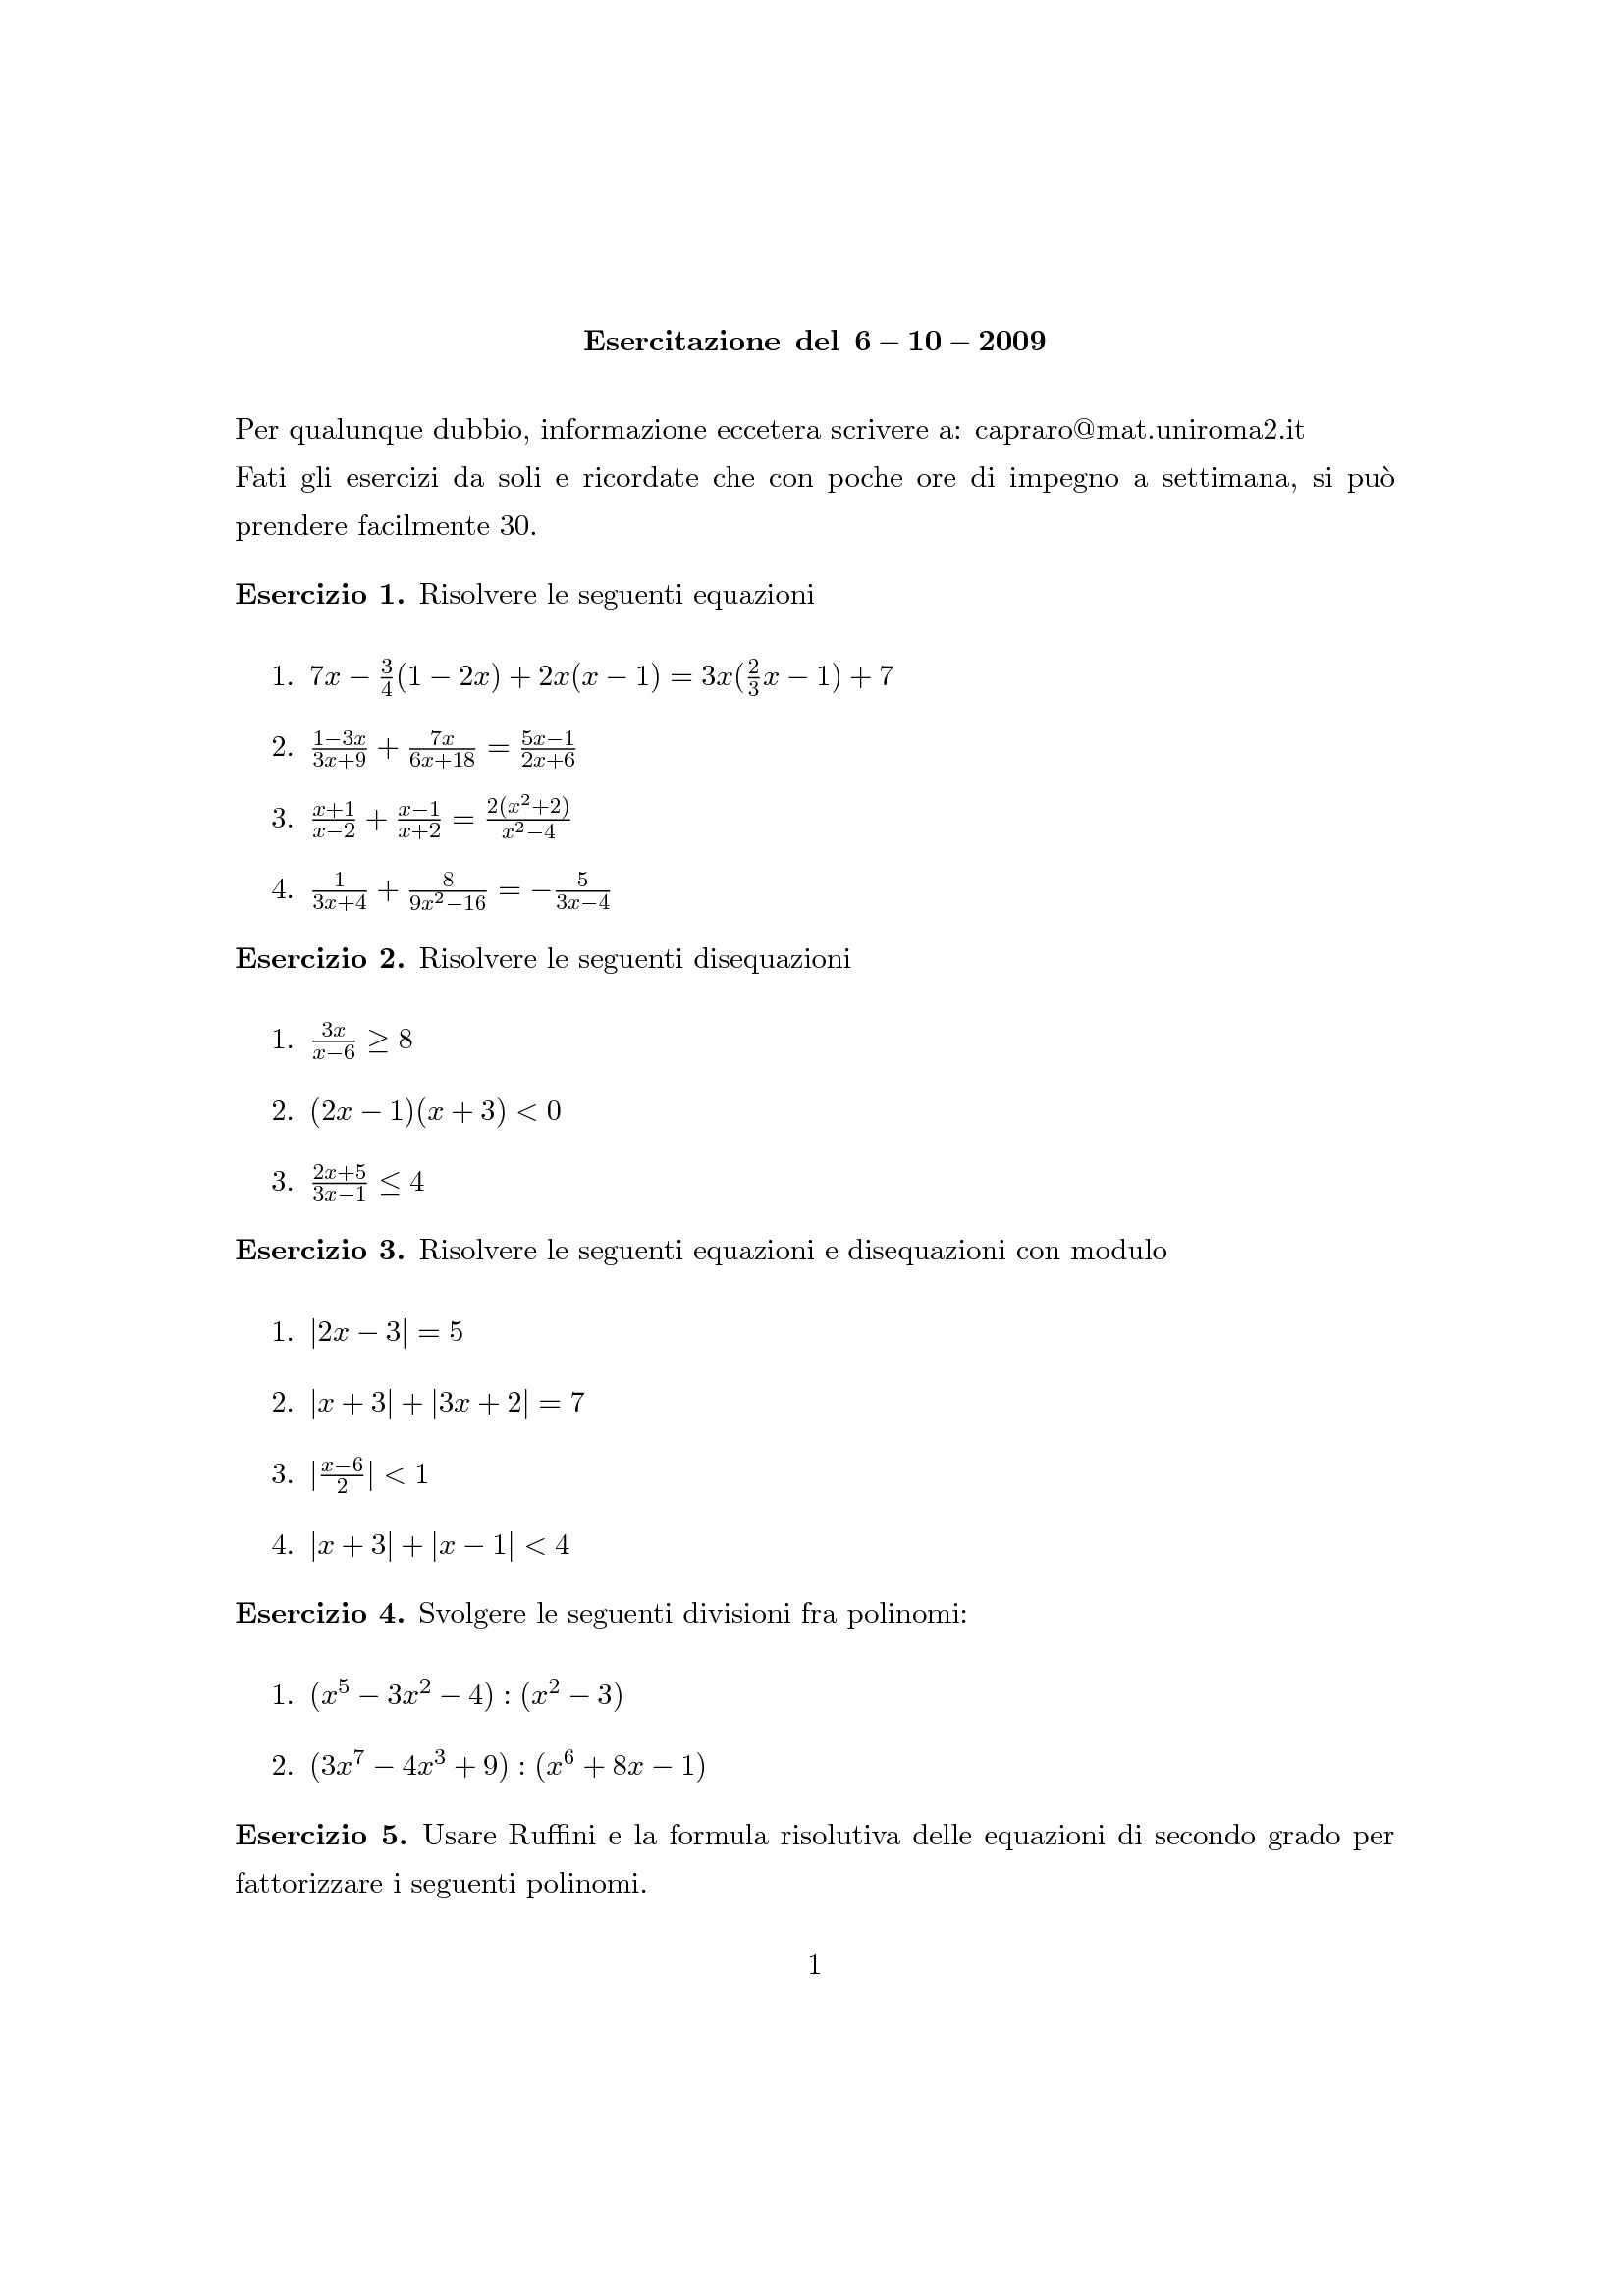 Matematica Generale - Polinomi, equazioni, disequazioni